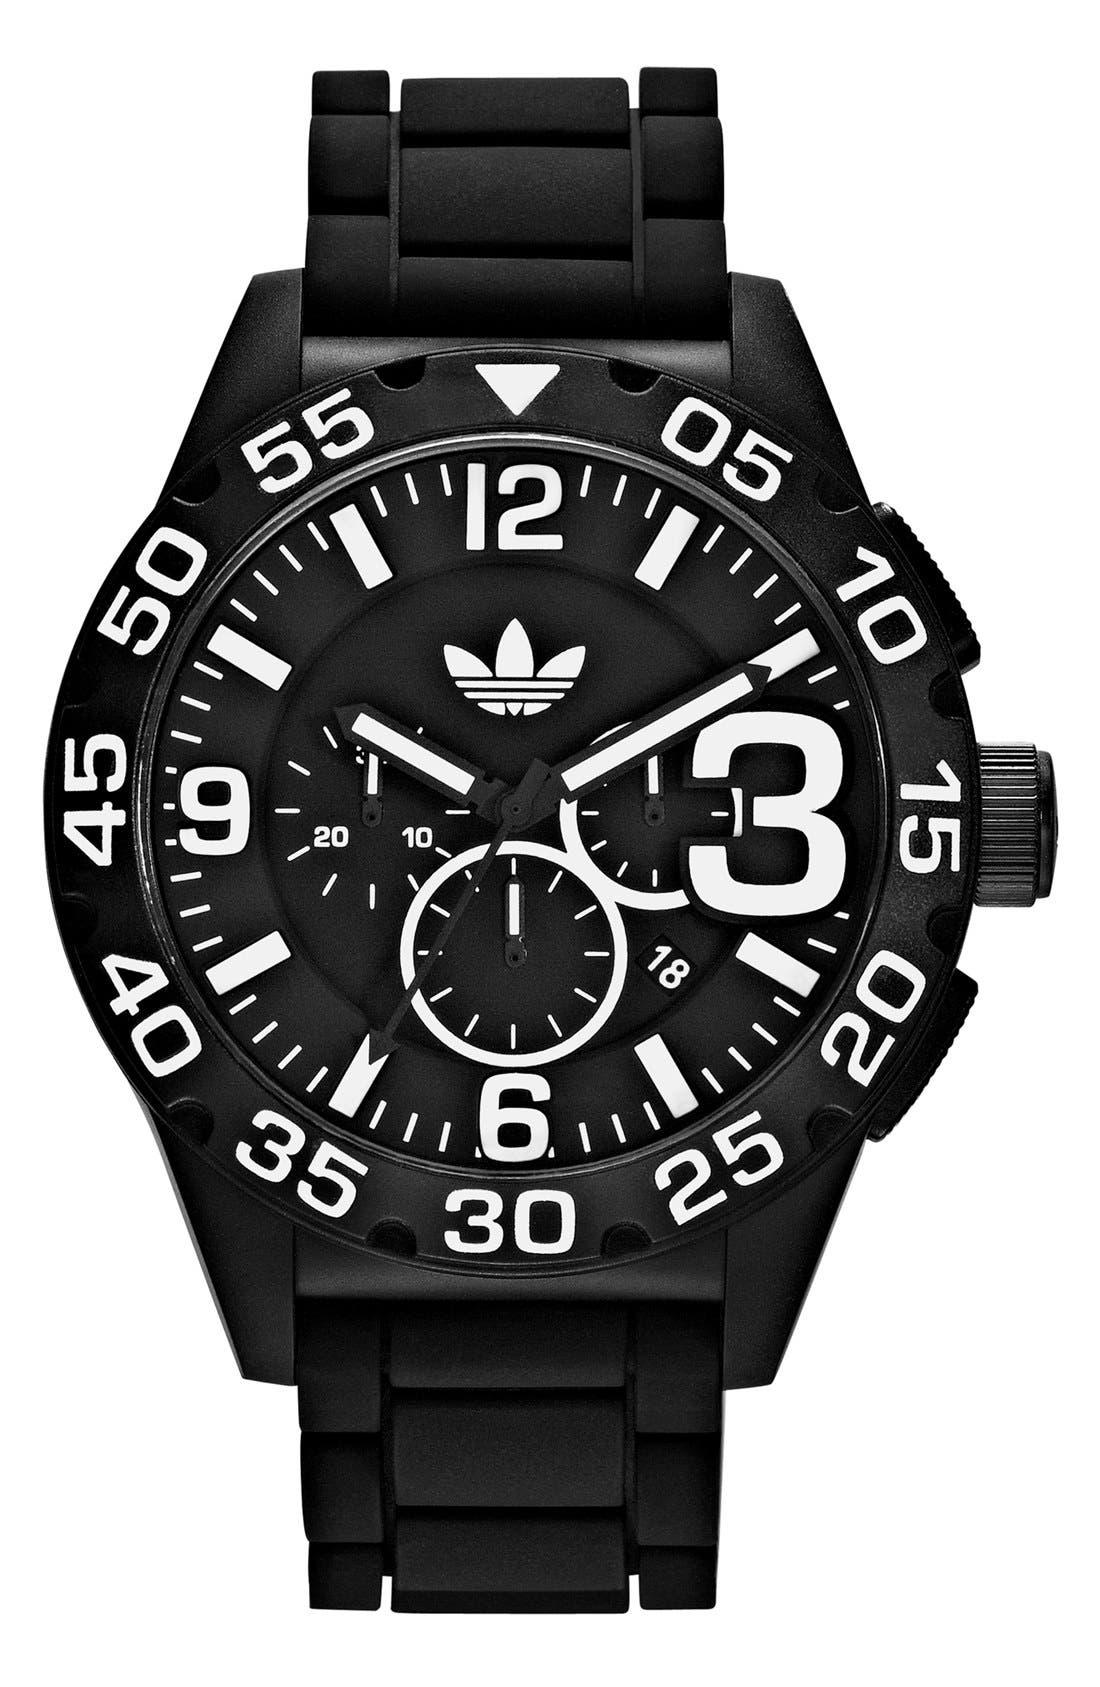 Main Image - adidas Originals 'Newburgh' Chronograph Watch, 48mm